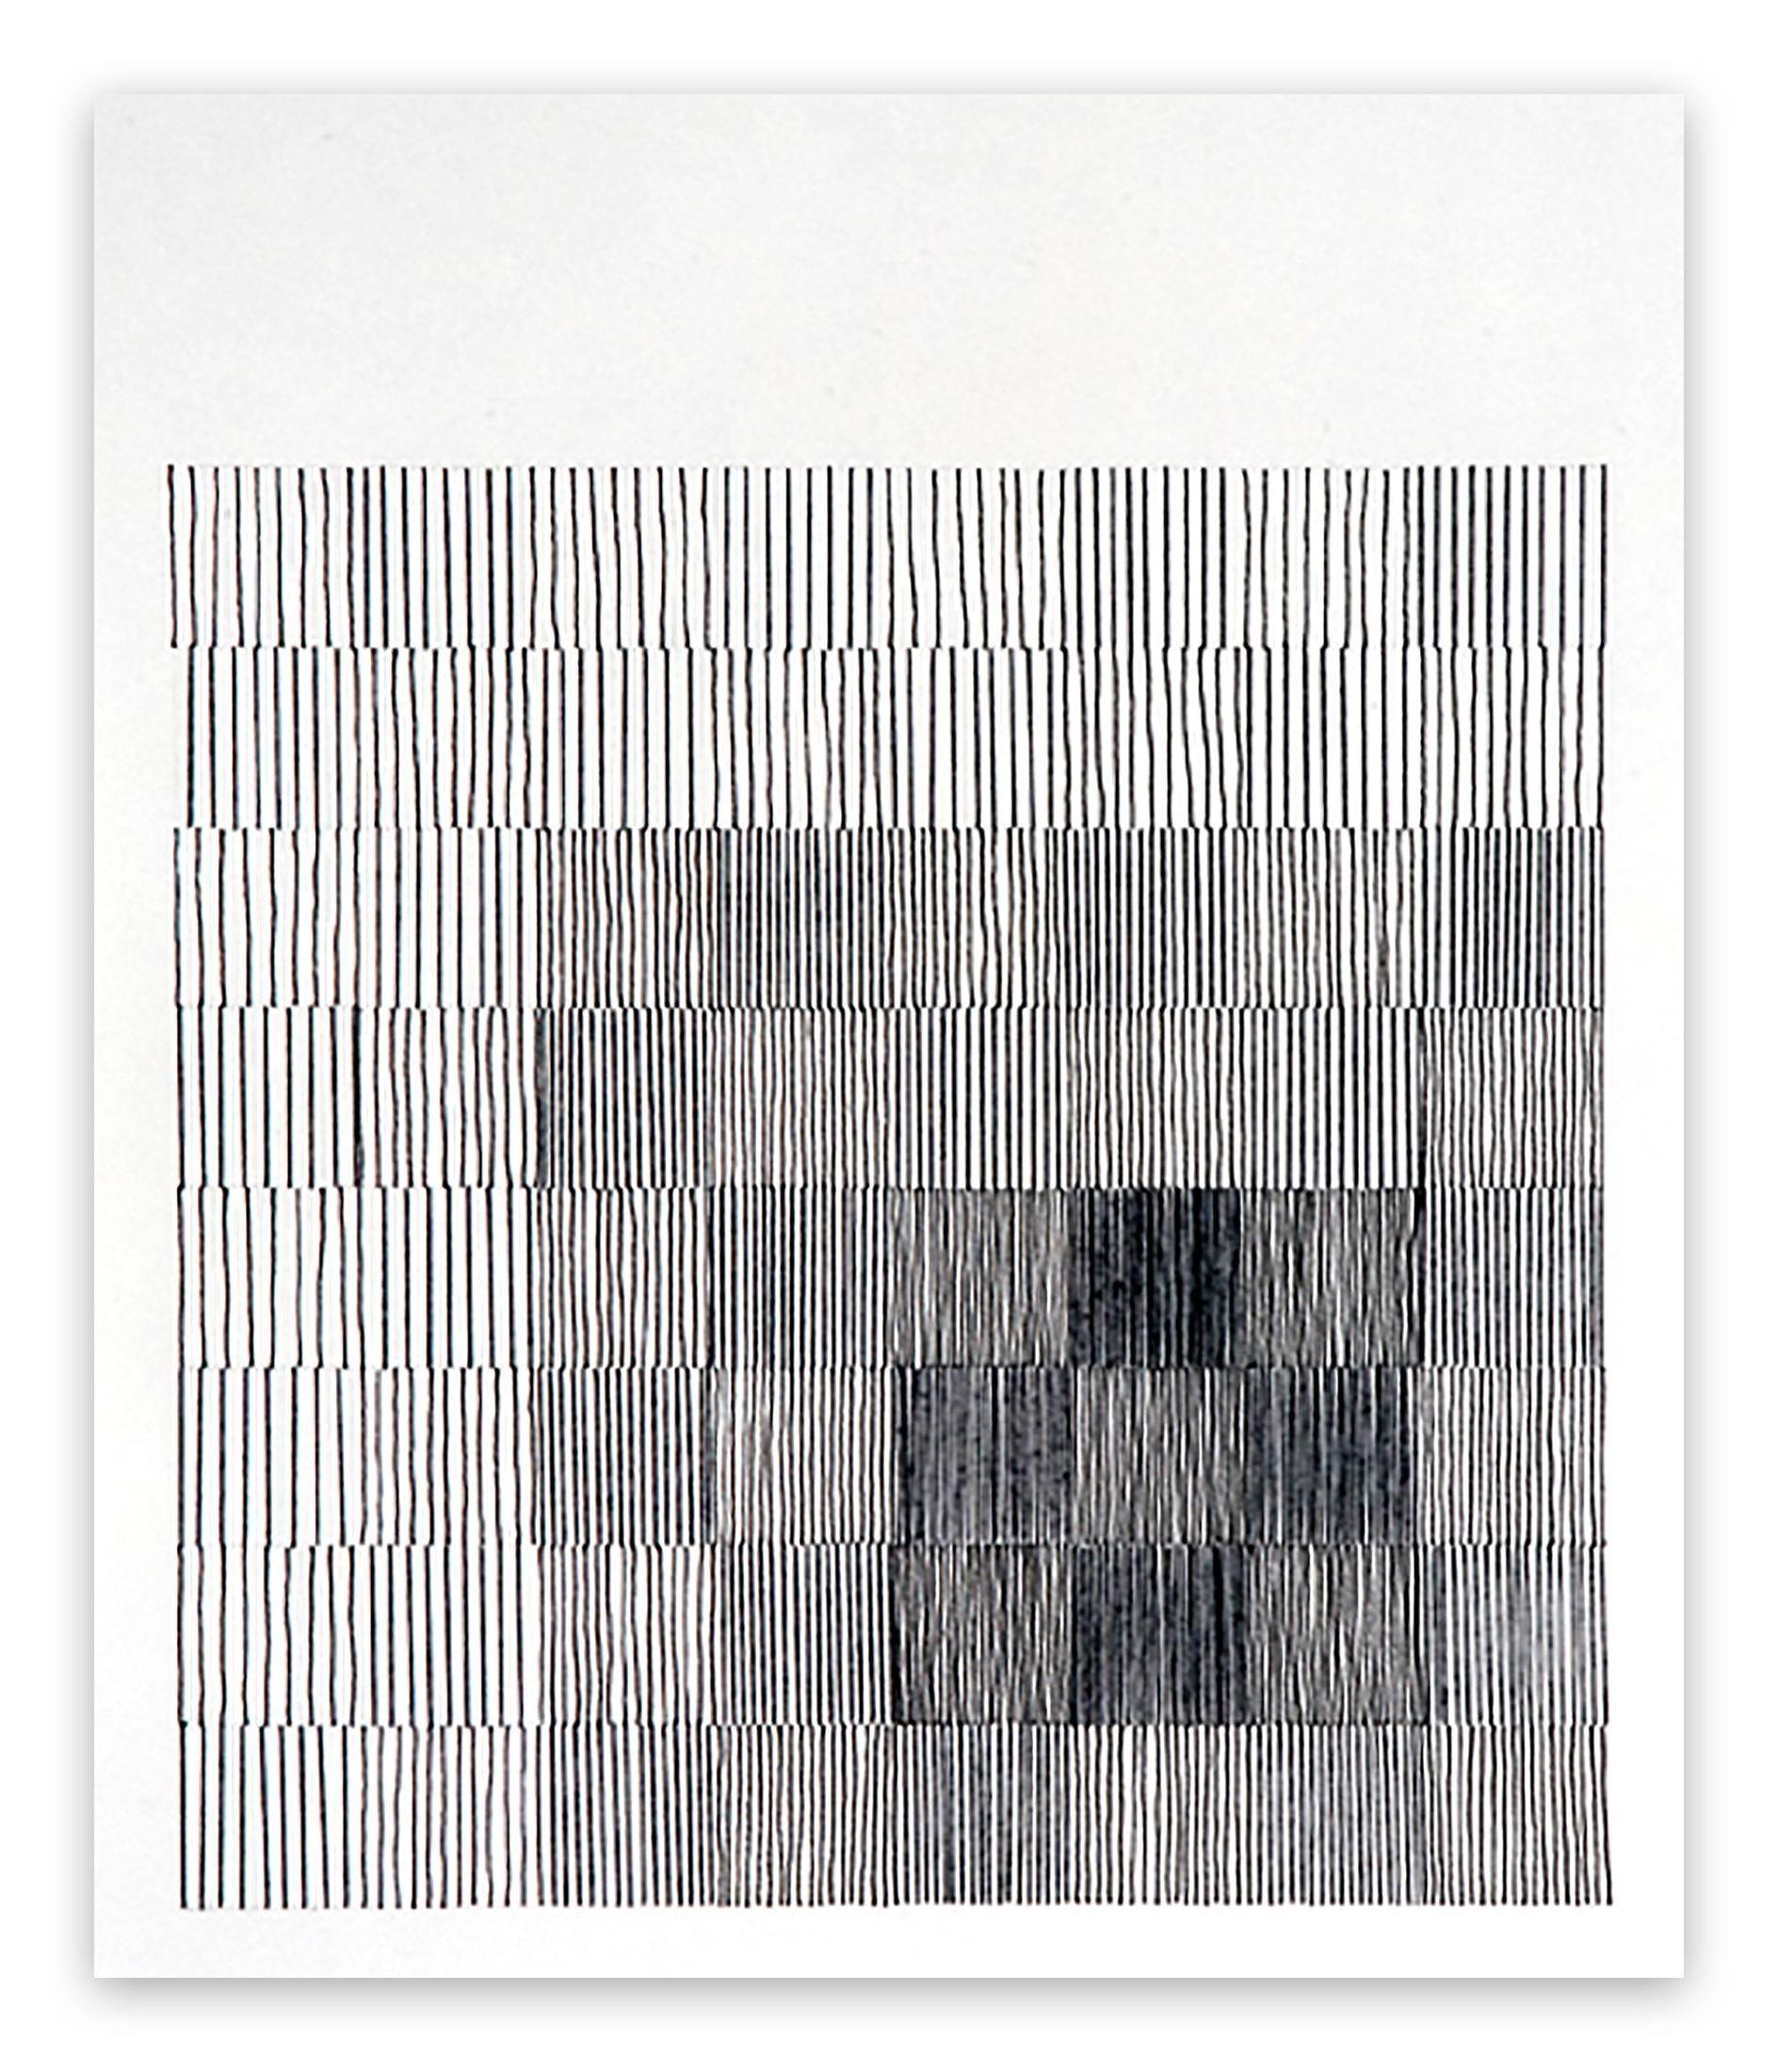 NB. 8 (Abstract drawing)